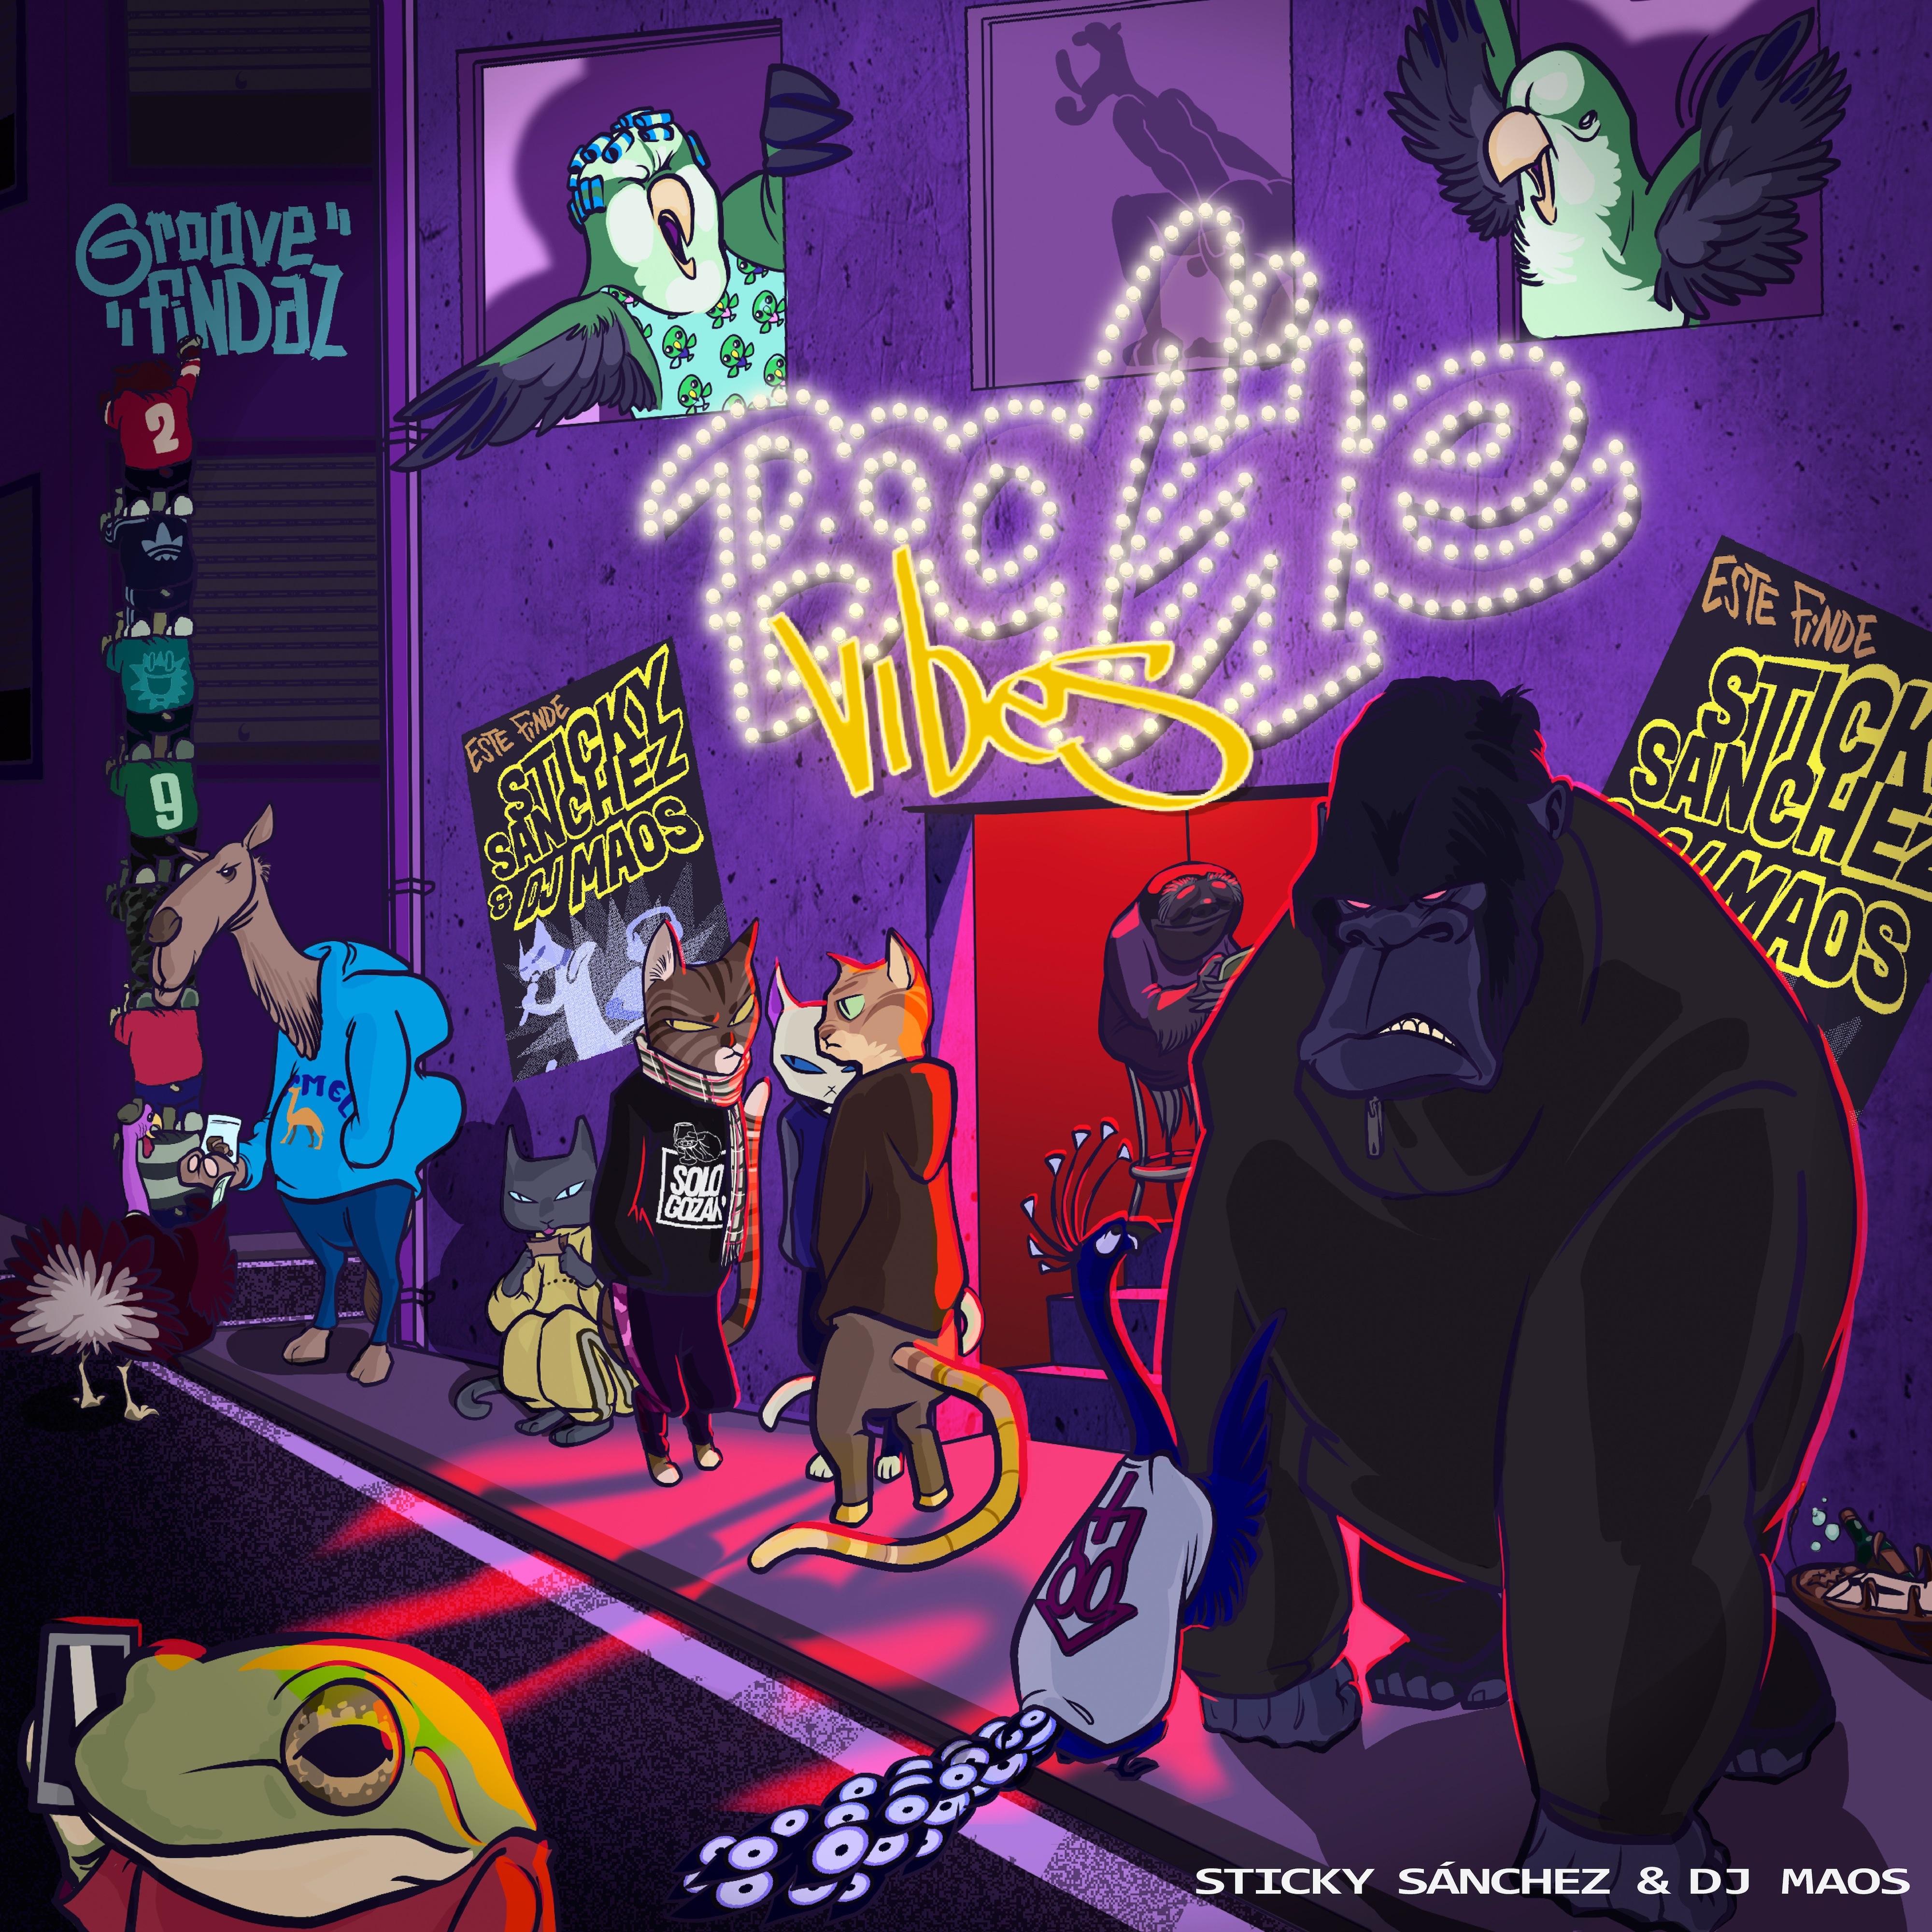 Sticky_s_nchez___dj_maos__boogie_vibes__portada